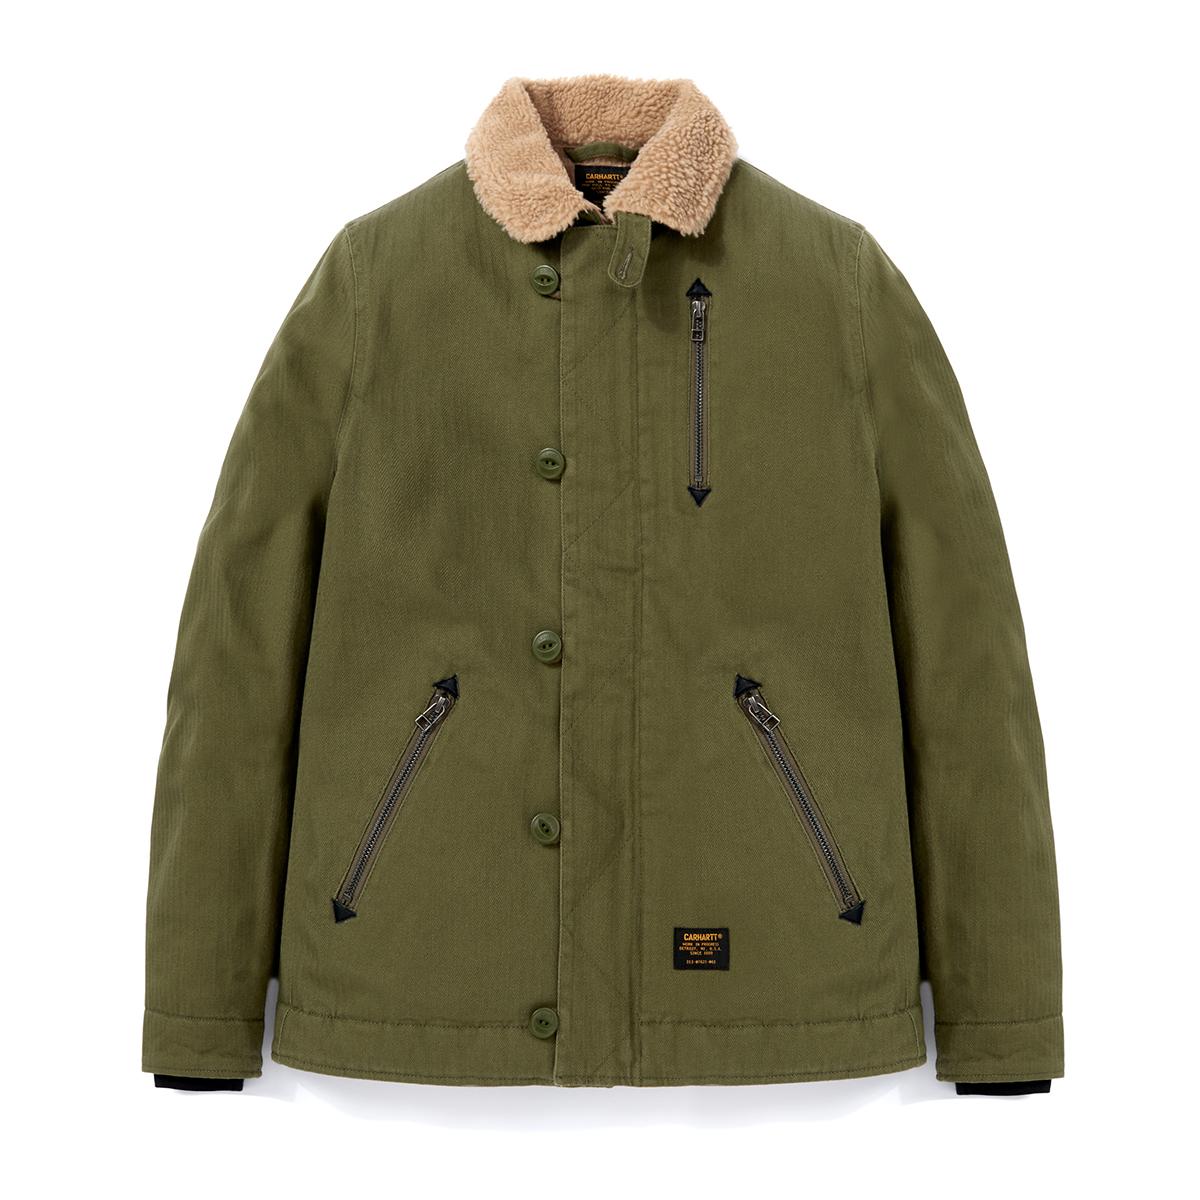 Winston Jacket